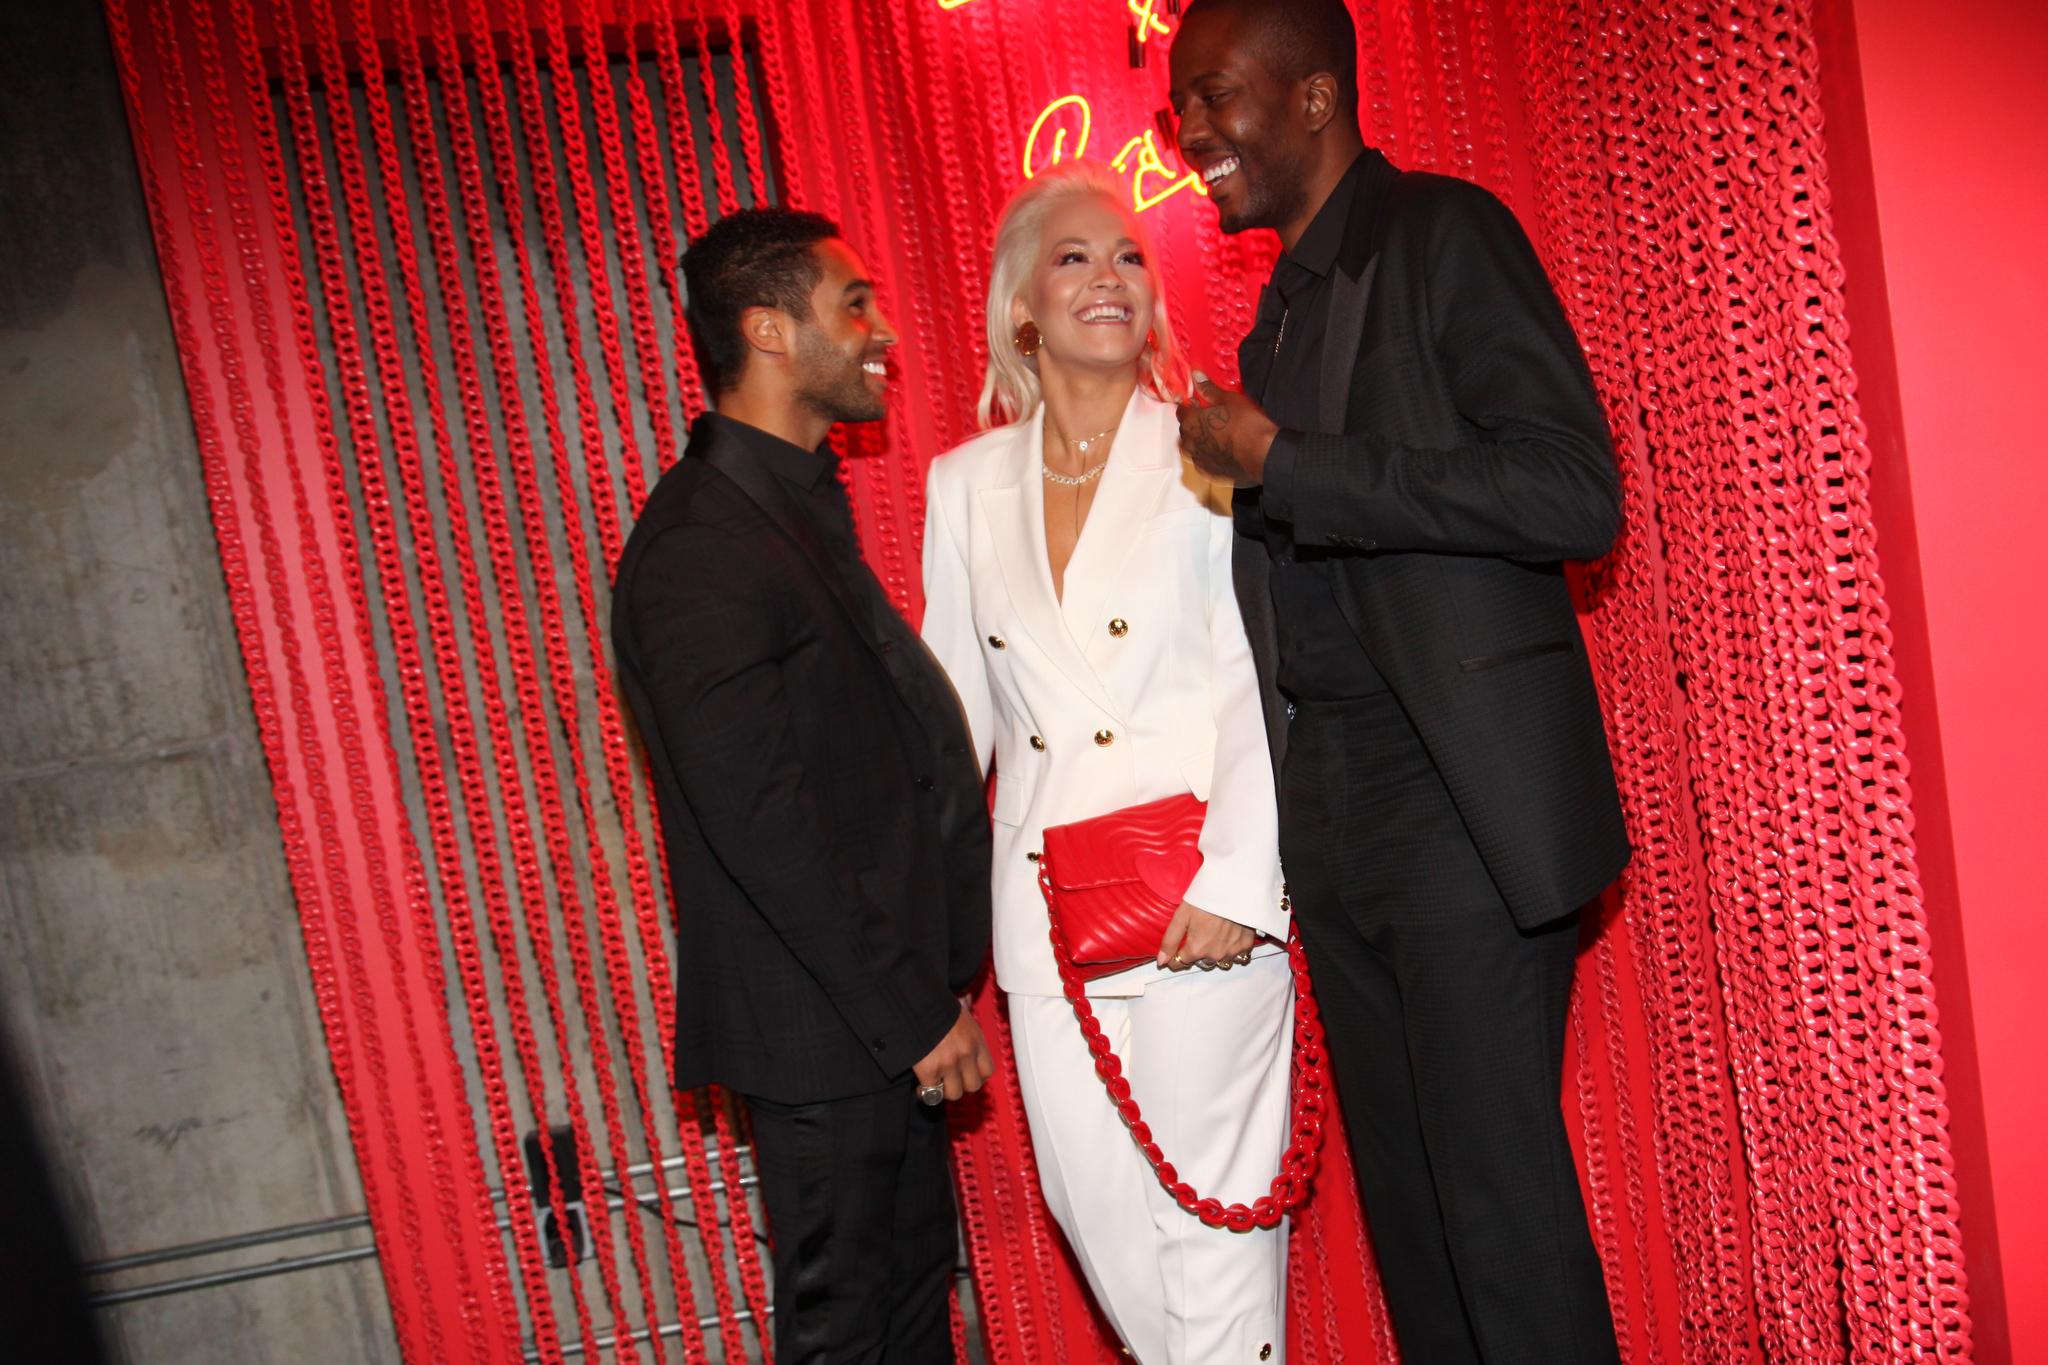 Lucian Laviscount, Rita Ora and Vas J MorganEscada dinner celebrating the launch of the new Heart Bag by Rita Ora, New York, USA - 27 Mar 2019